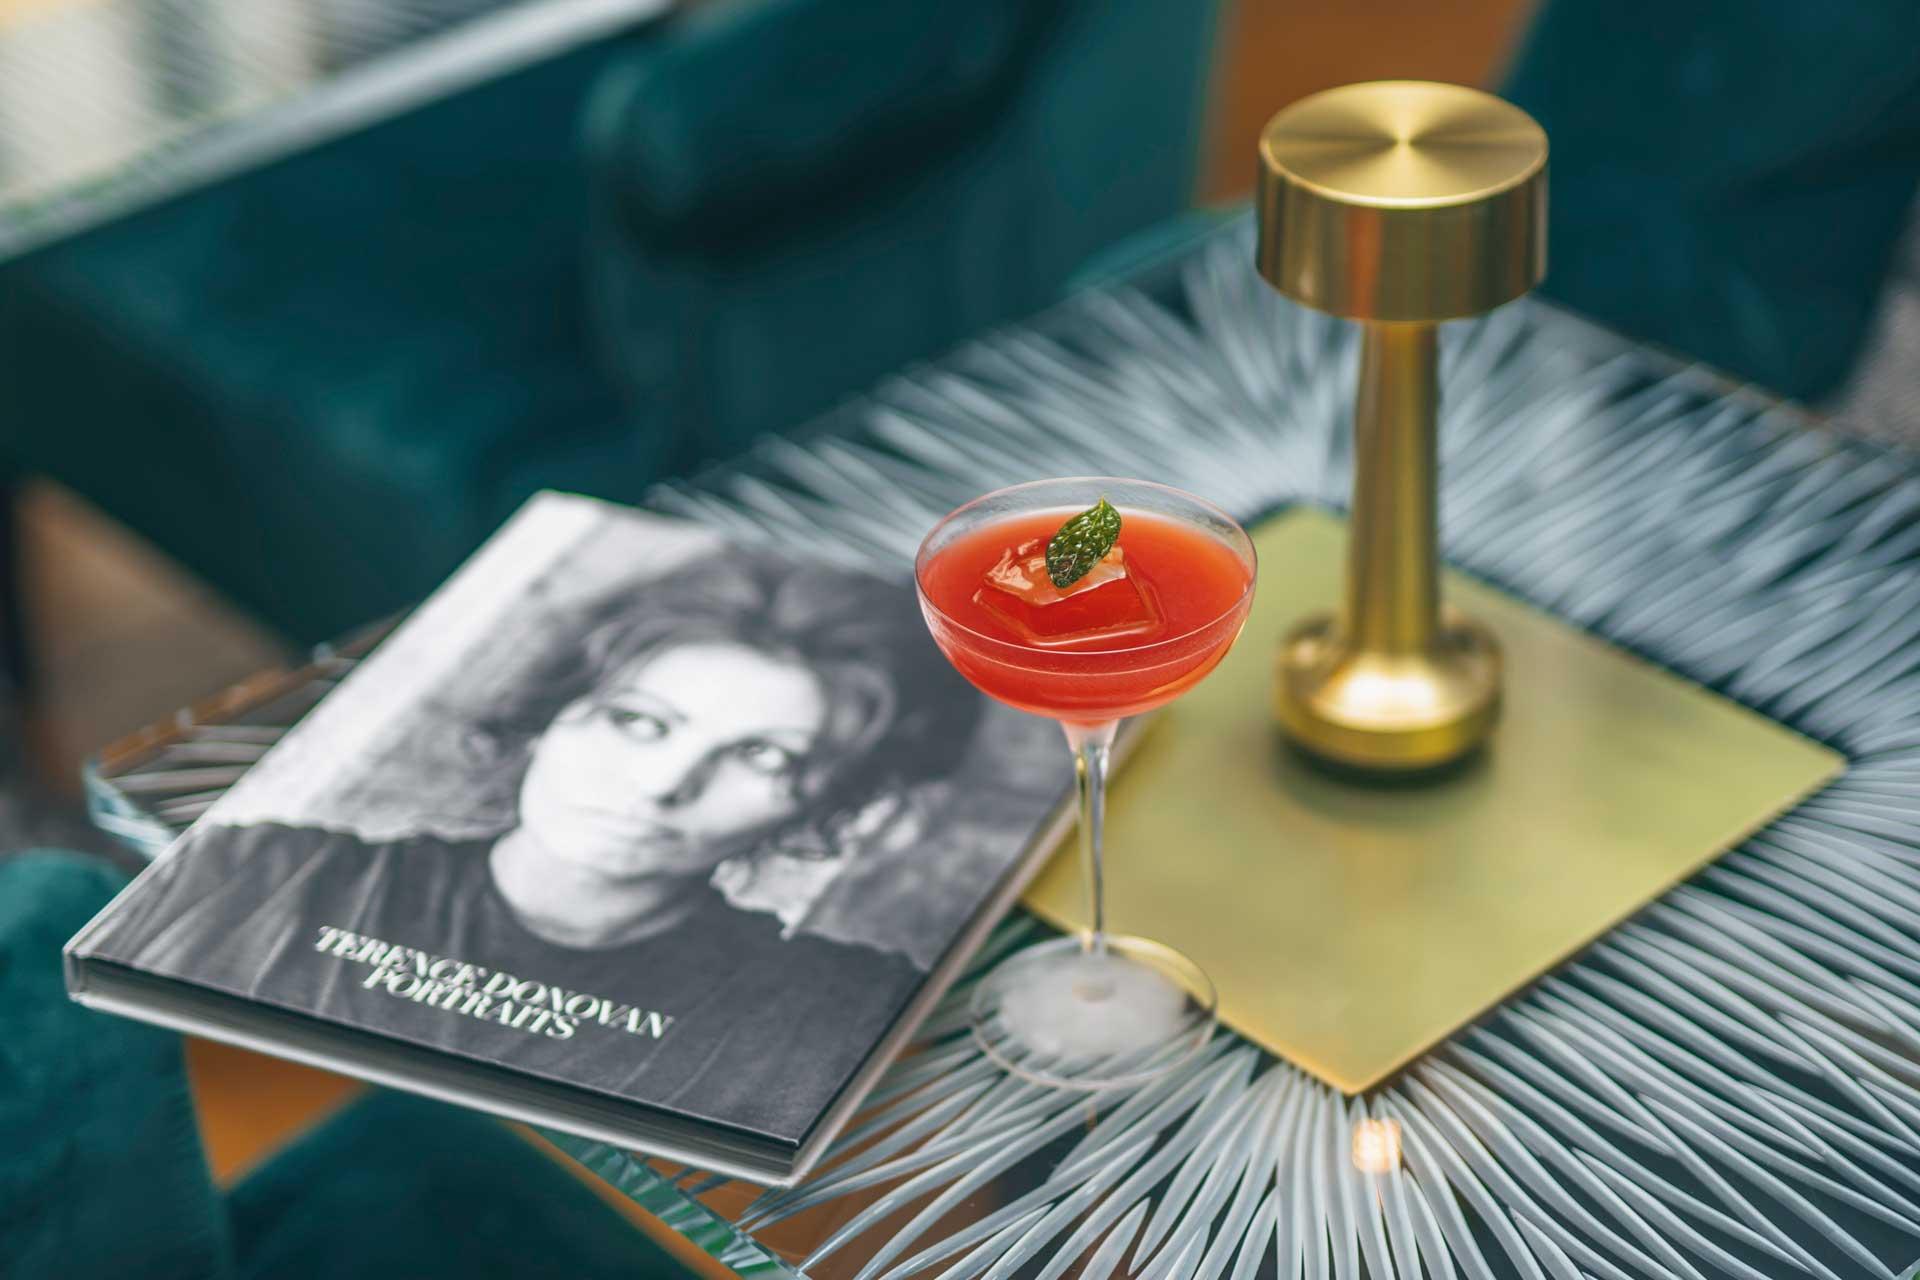 The Madam Loren cocktail is inspired by Italian actress Sophia Loren